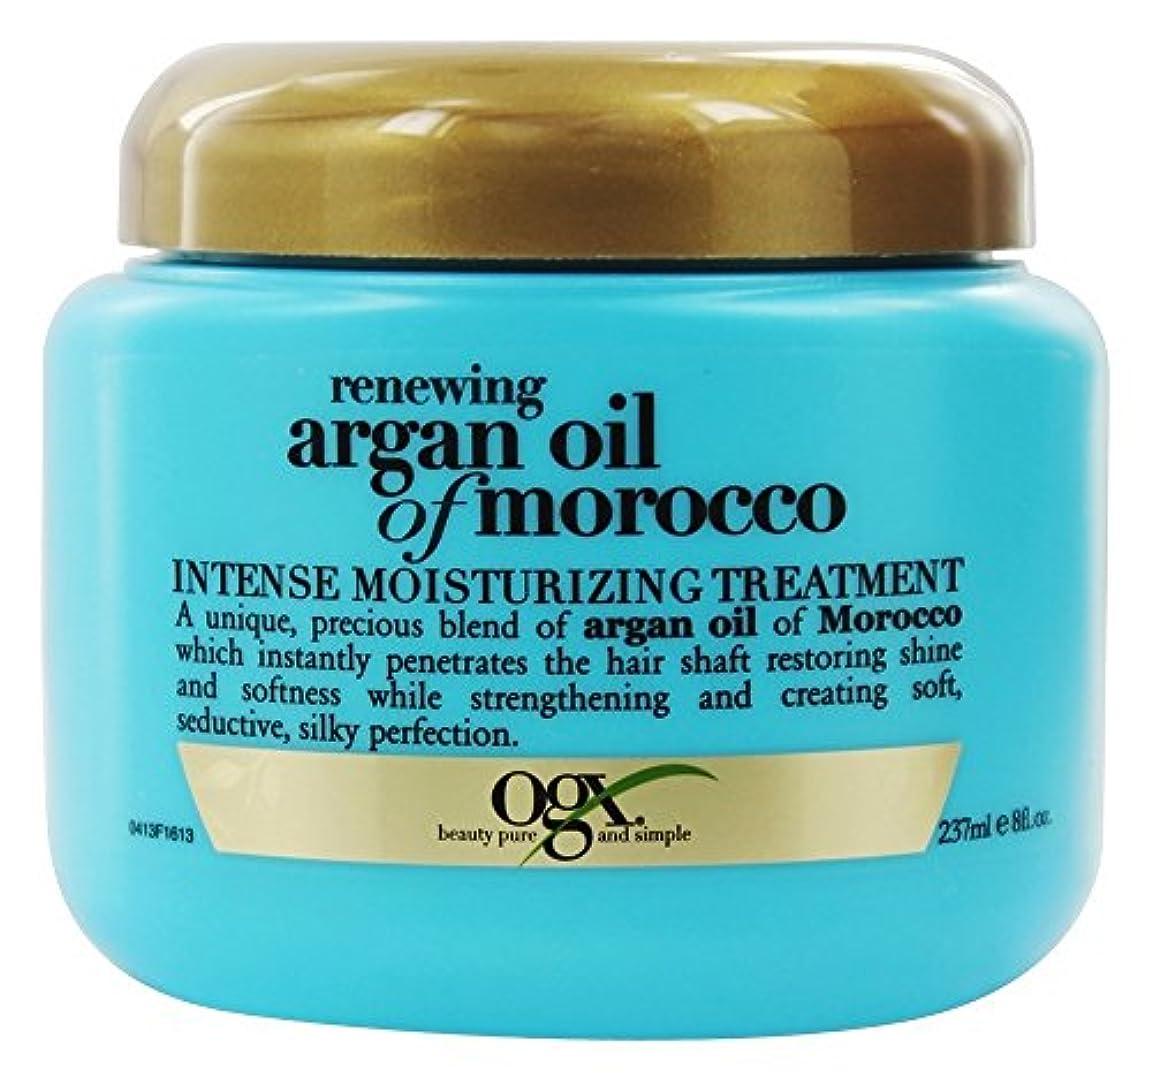 Organix - モロッコのArganオイルを更新する強い保湿の処置 - 8ポンド [並行輸入品]